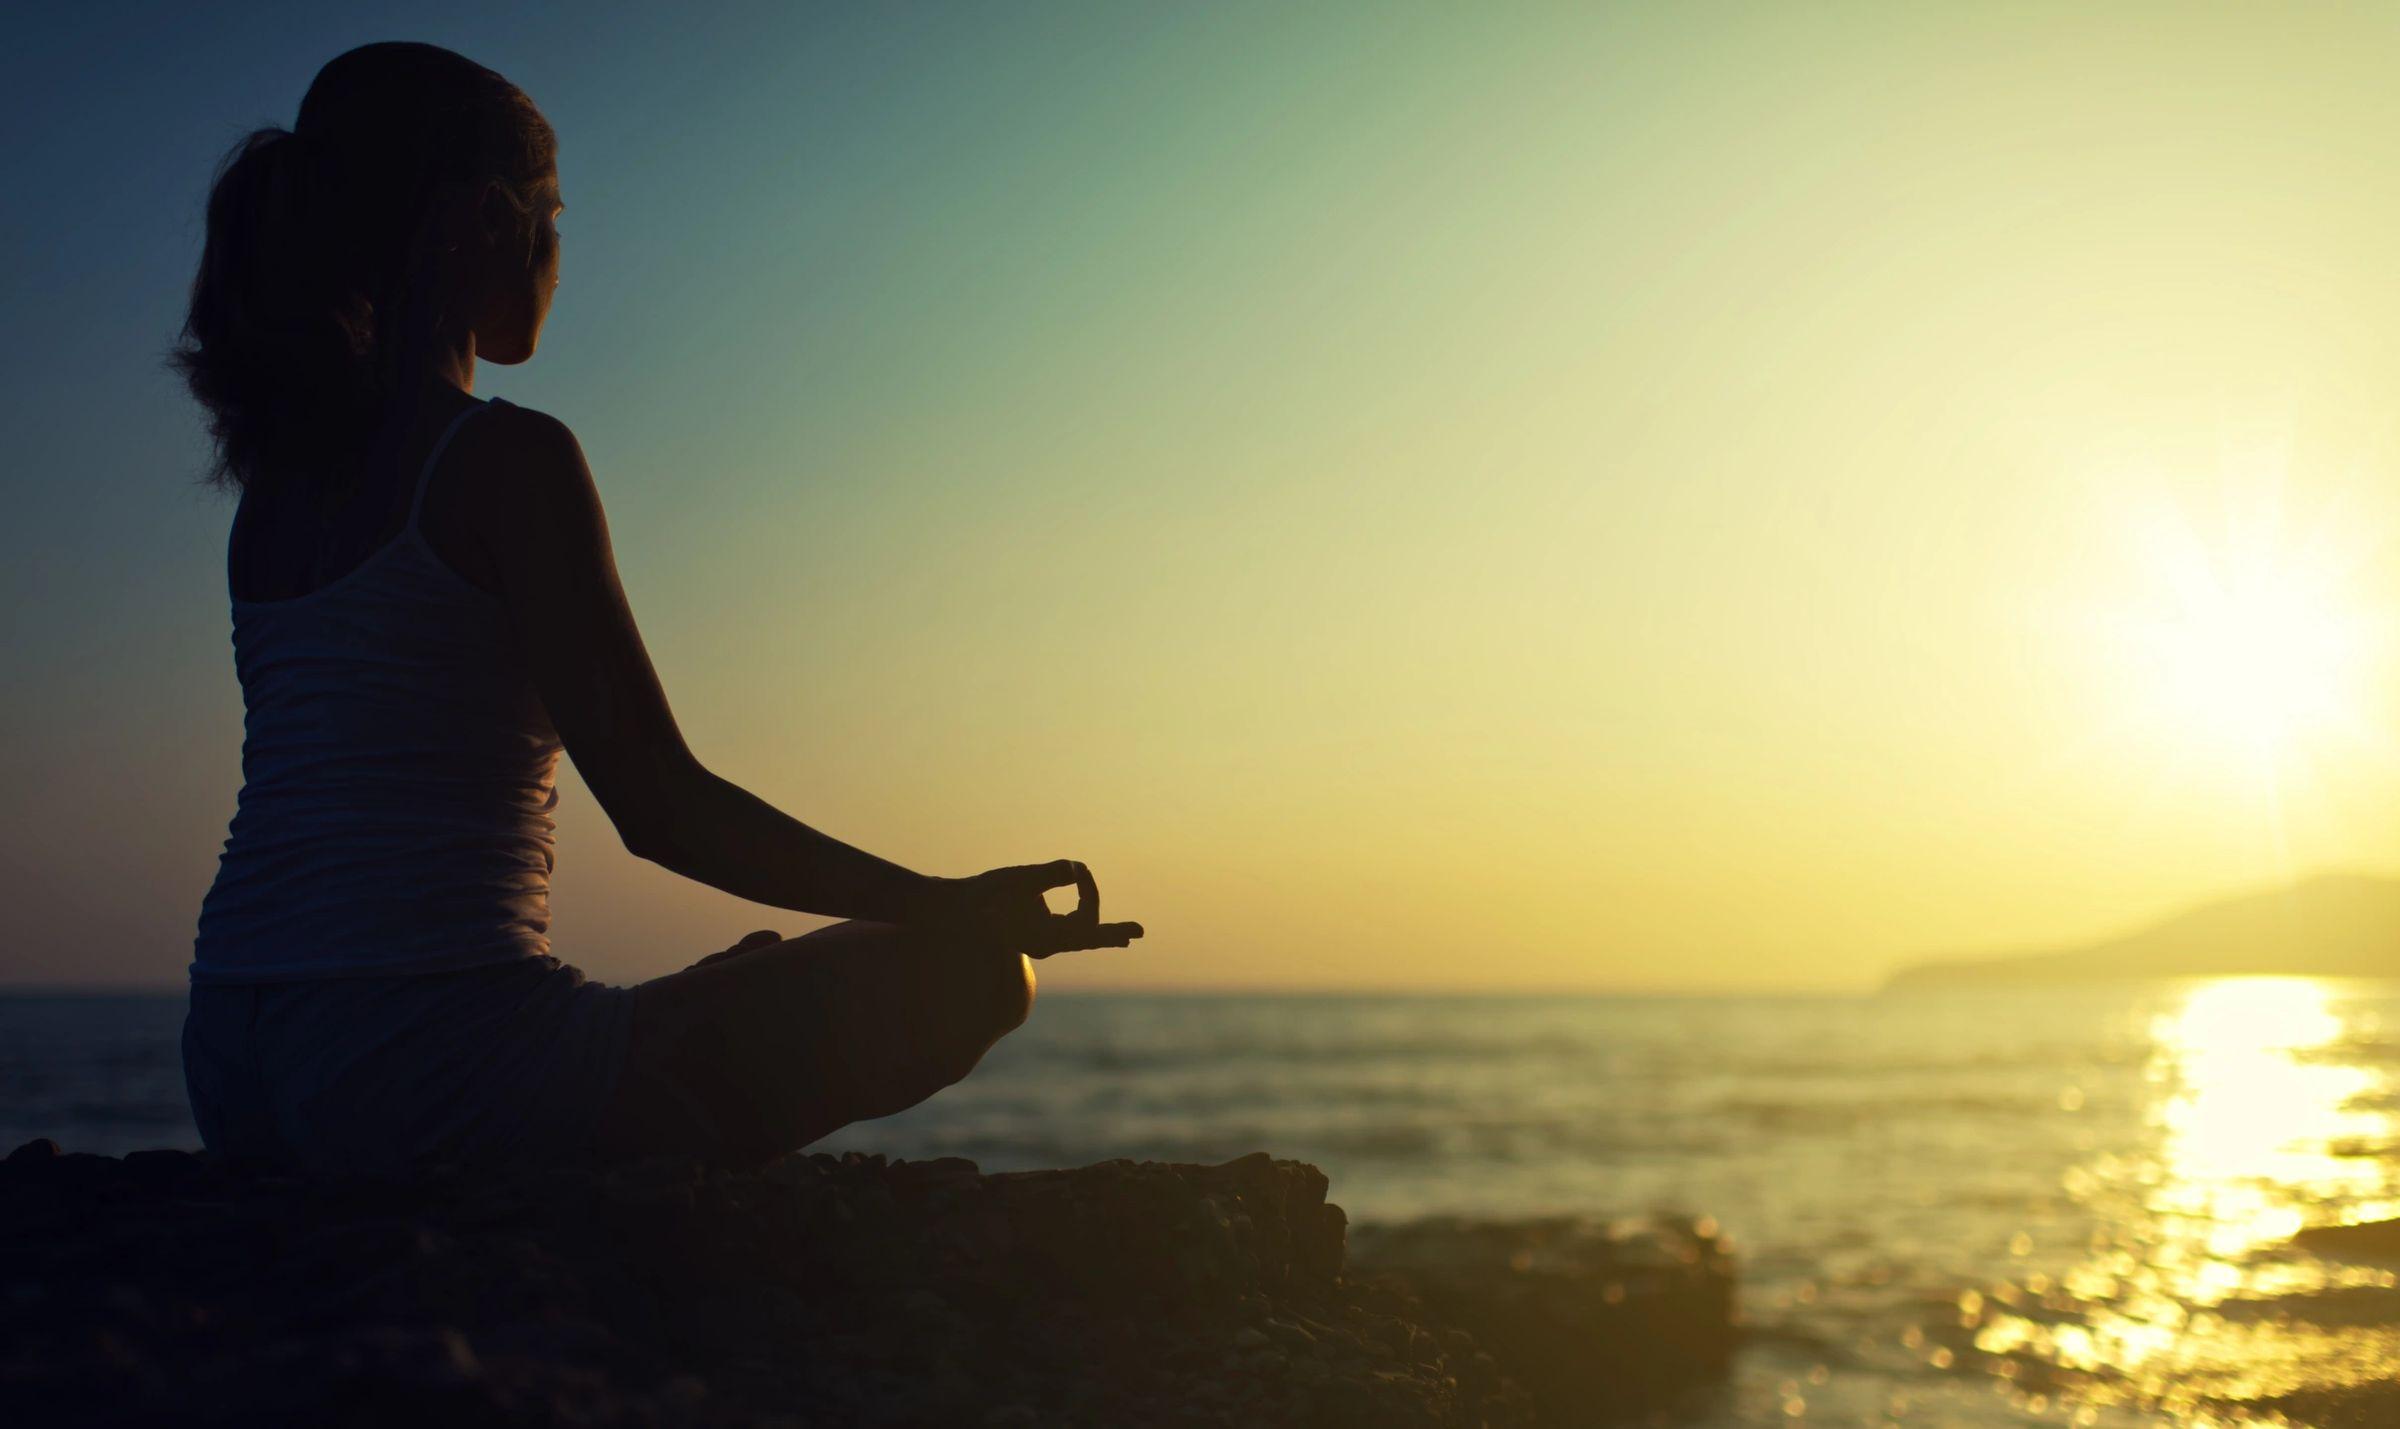 Meditation is powerful